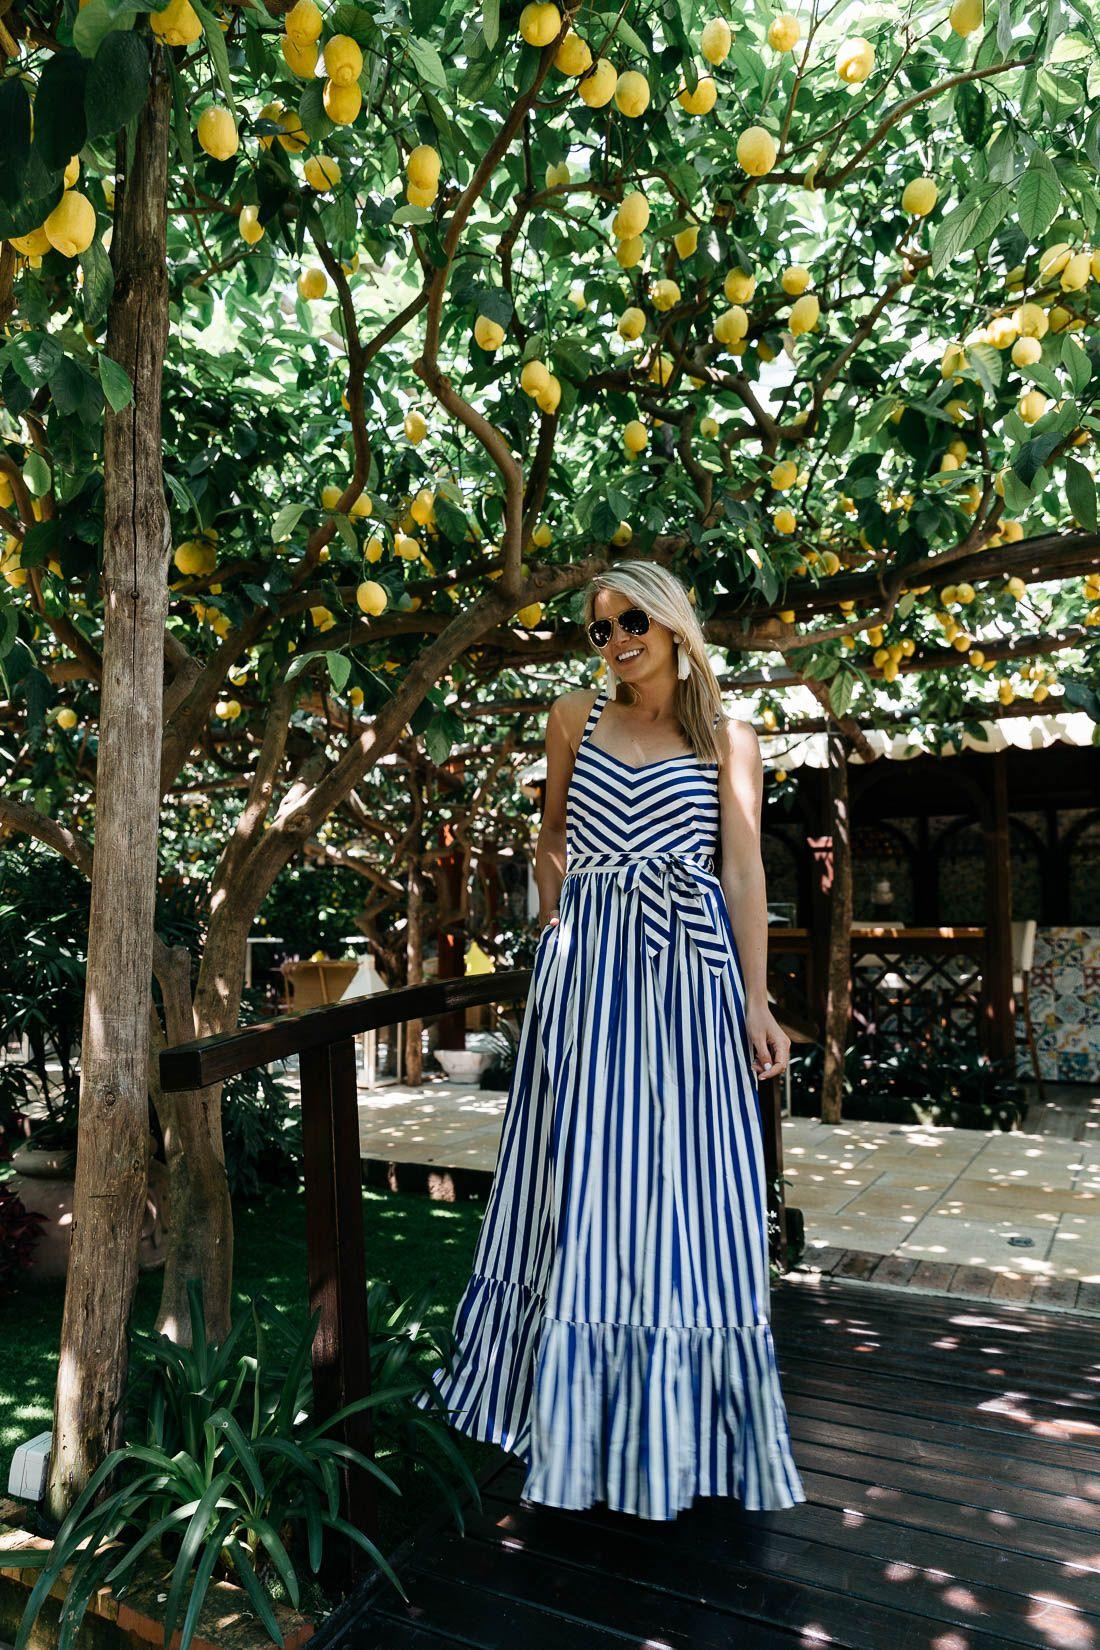 Capri Travel Guide Styled Snapshots Summer Maxi Dress Maxi Dress Striped Maxi Dresses [ 1650 x 1100 Pixel ]